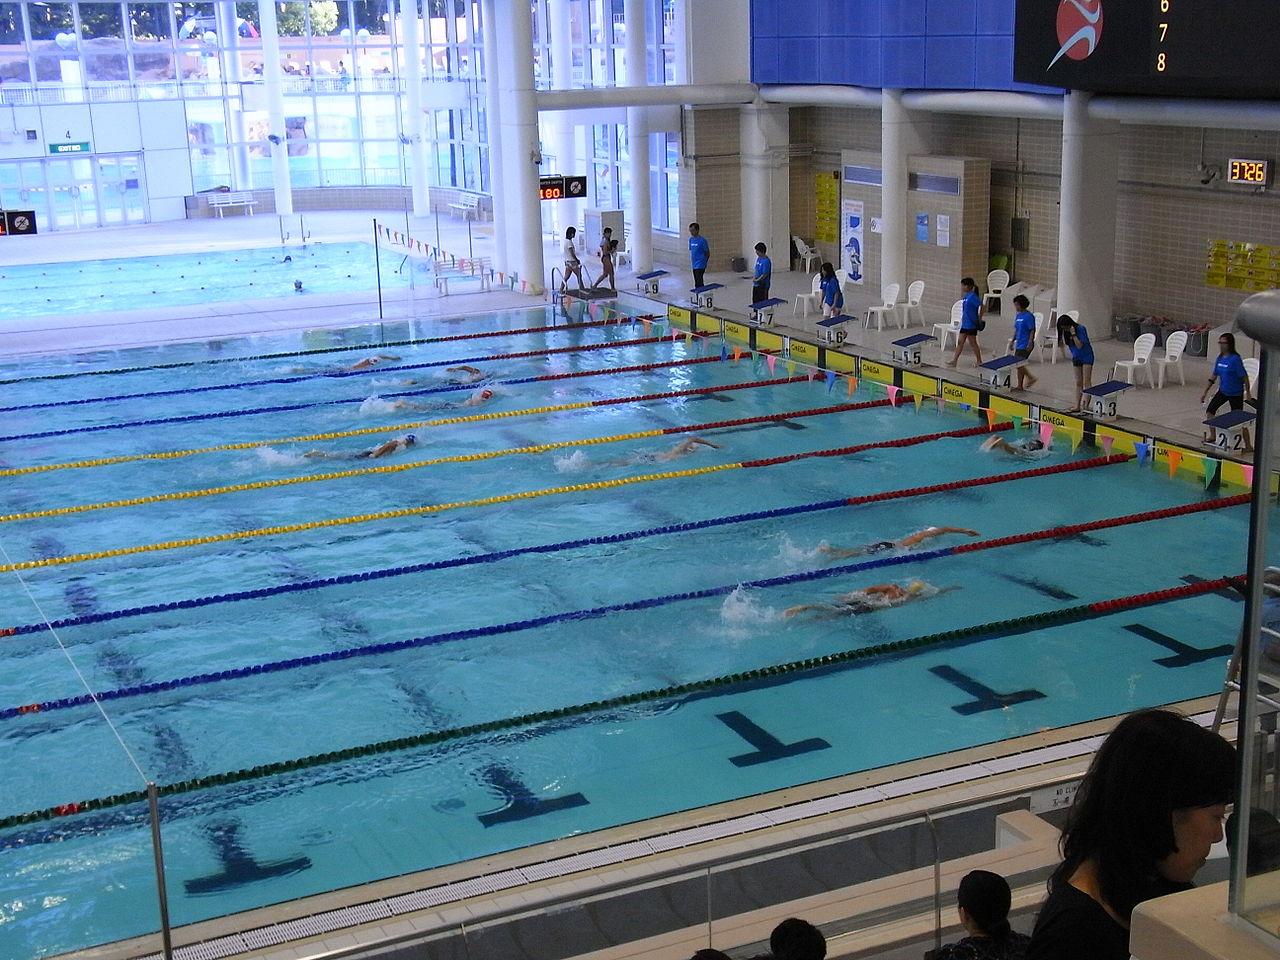 File:HK TST Kln Park Swimming Pool 06 Indoor July 2012.JPG